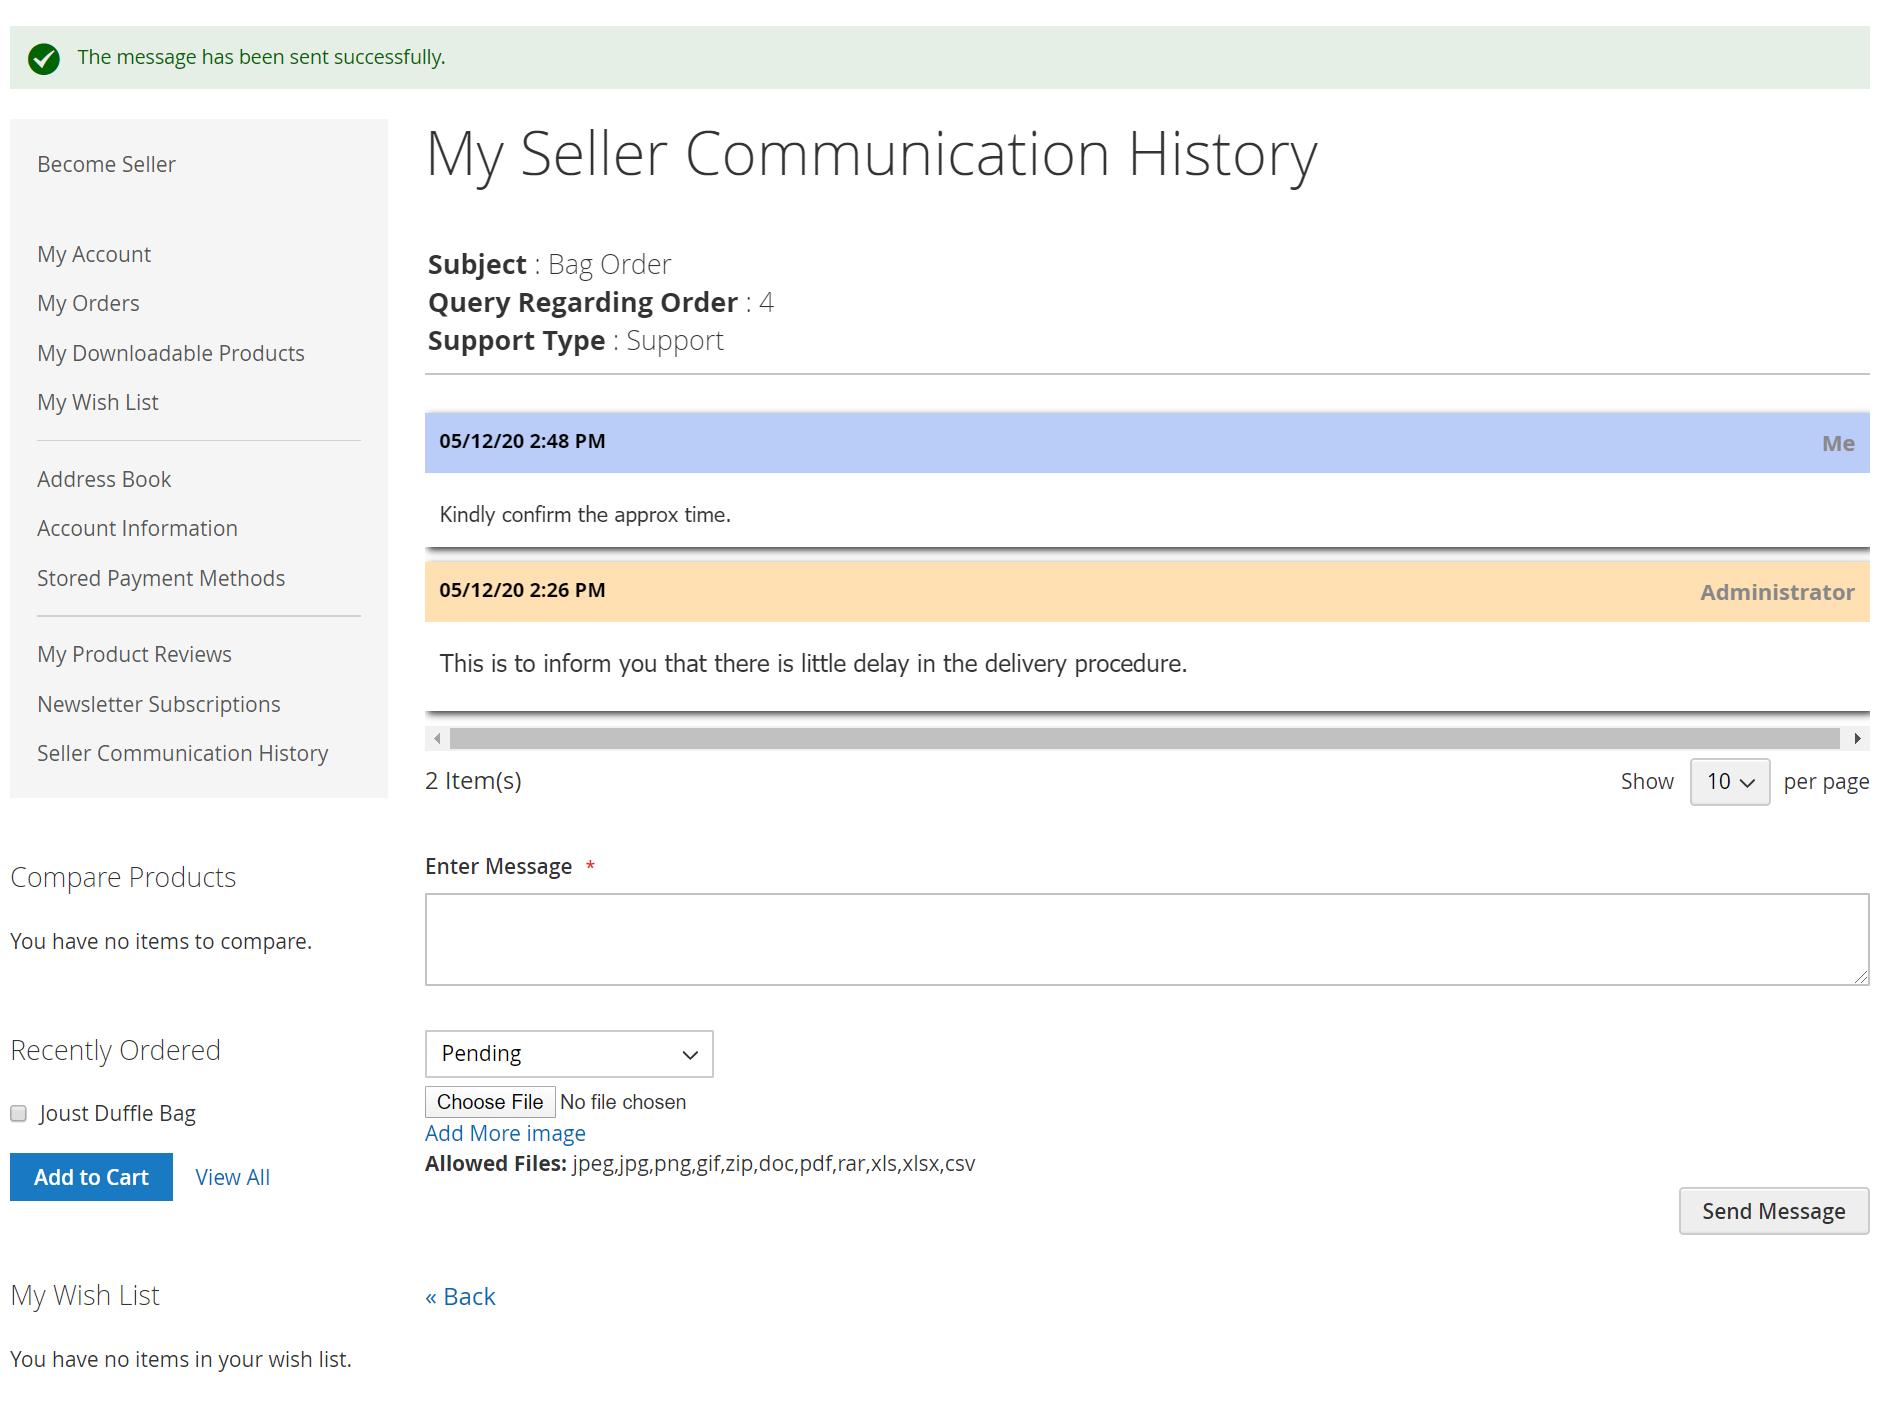 customer_response